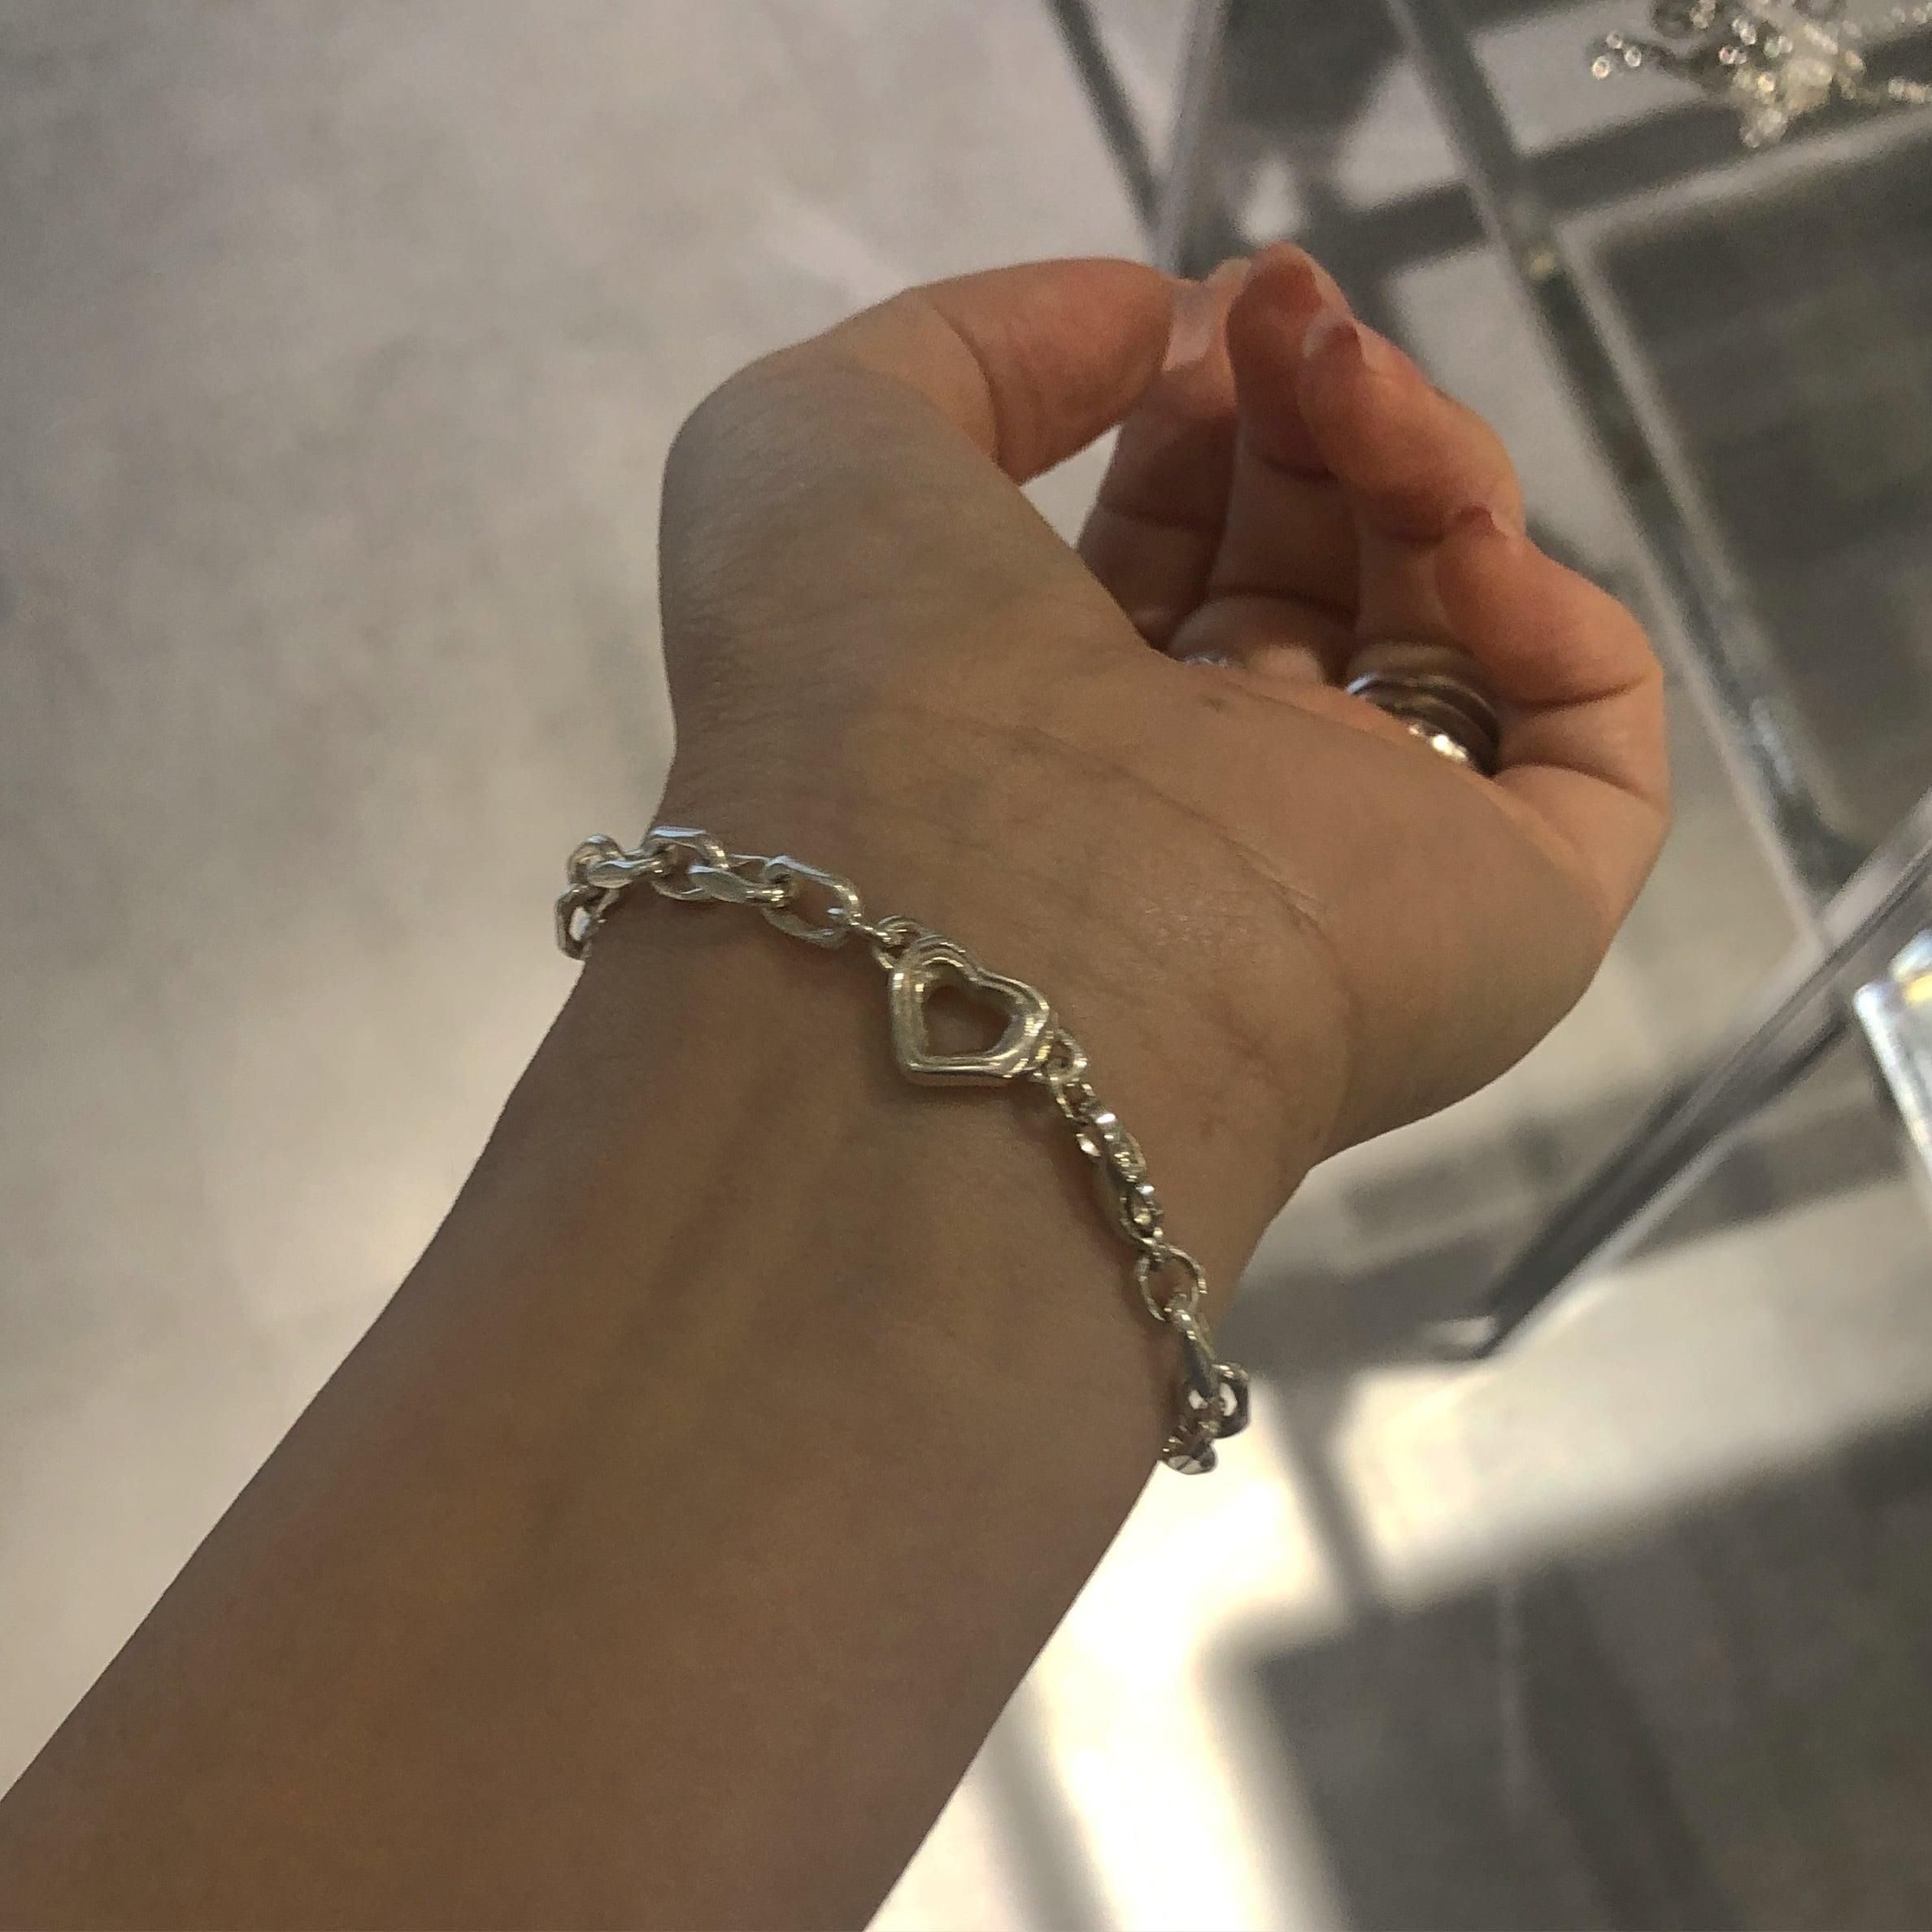 bone HEART chain bracelet silver925 #LJ20016B